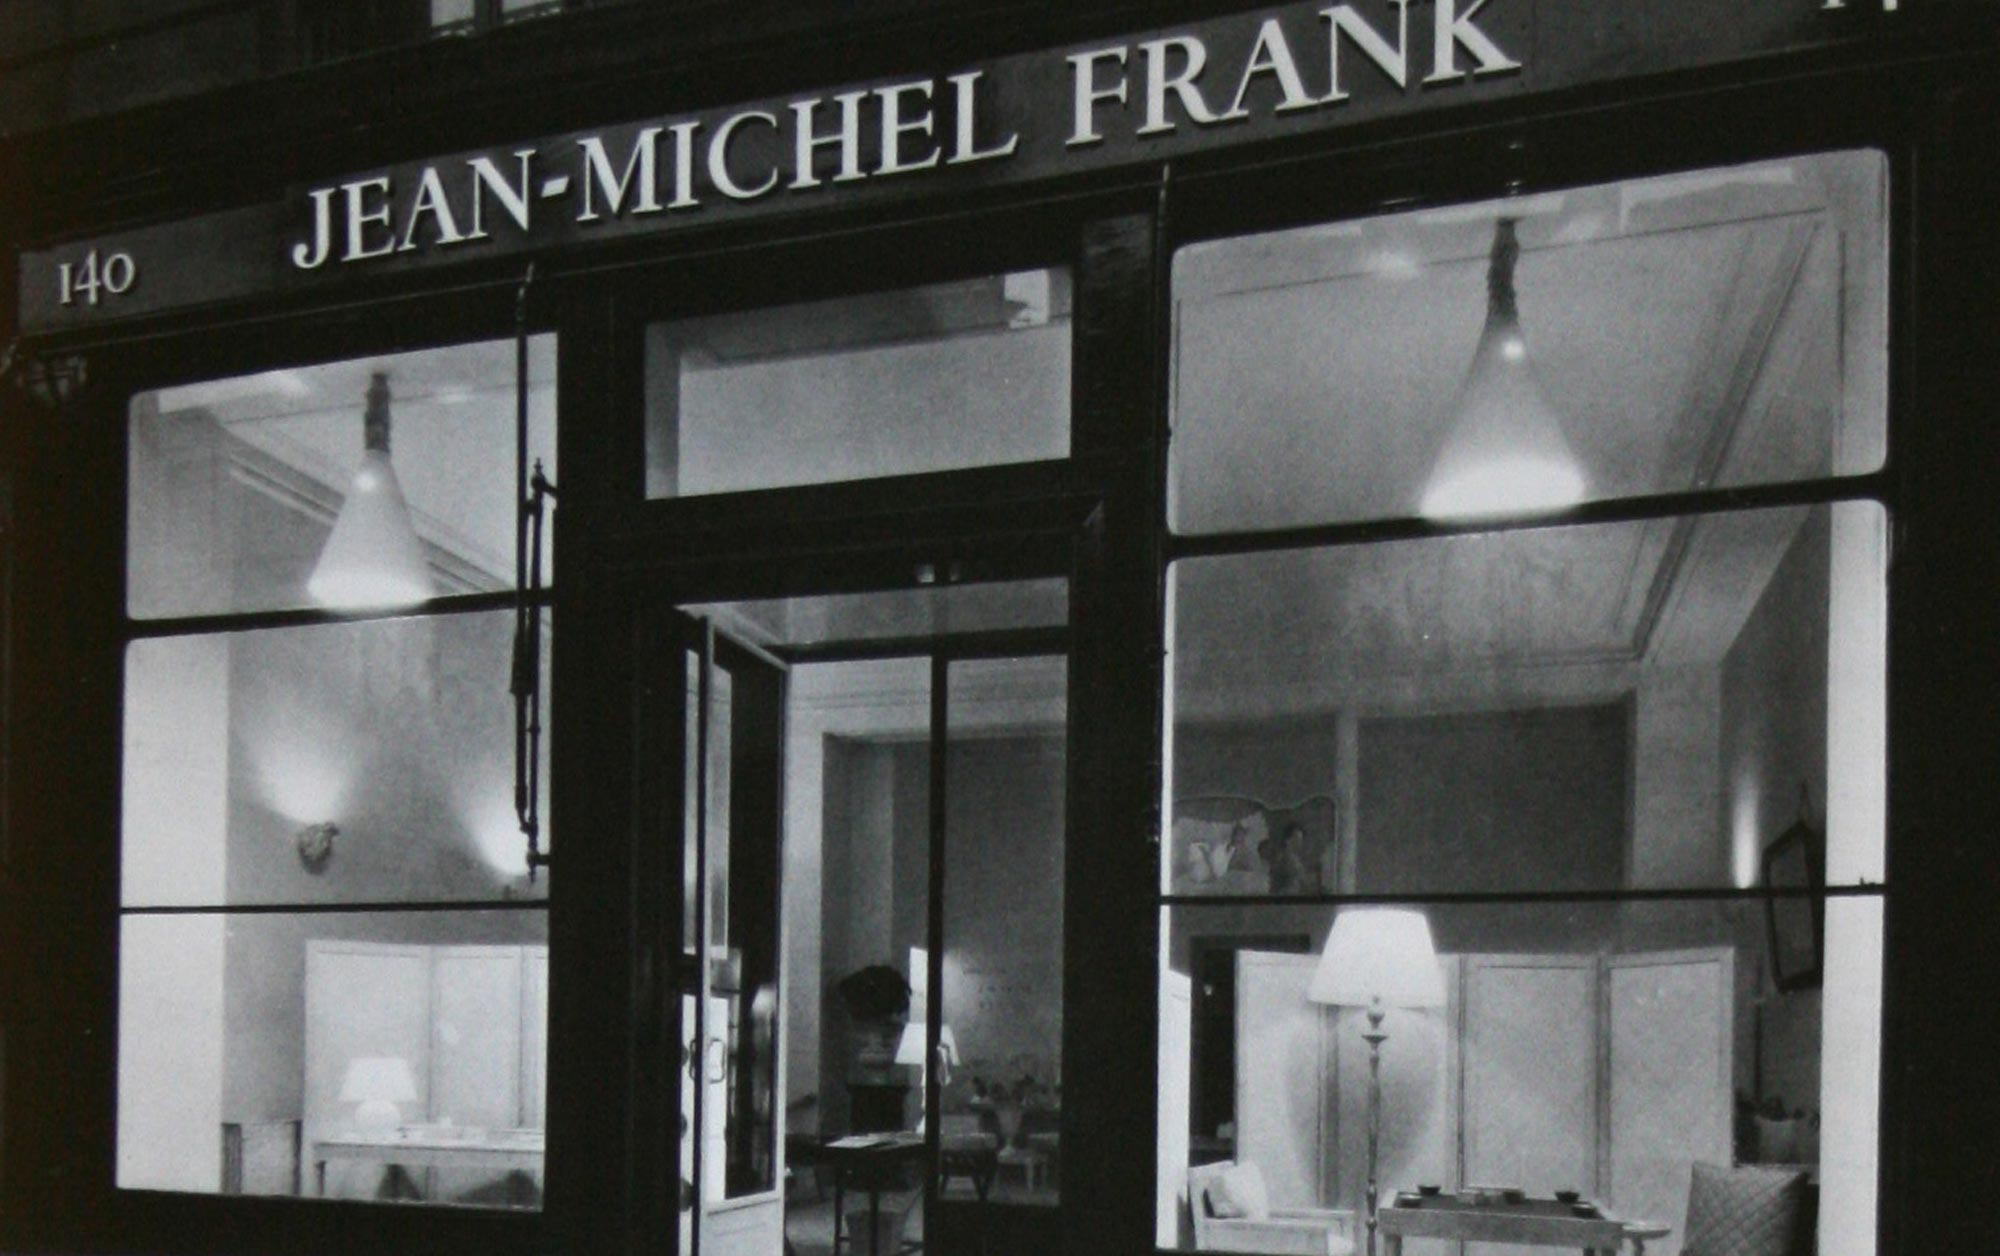 jean michel frank enfin la biographie above luxe actualit luxe lifestyle exigeant. Black Bedroom Furniture Sets. Home Design Ideas